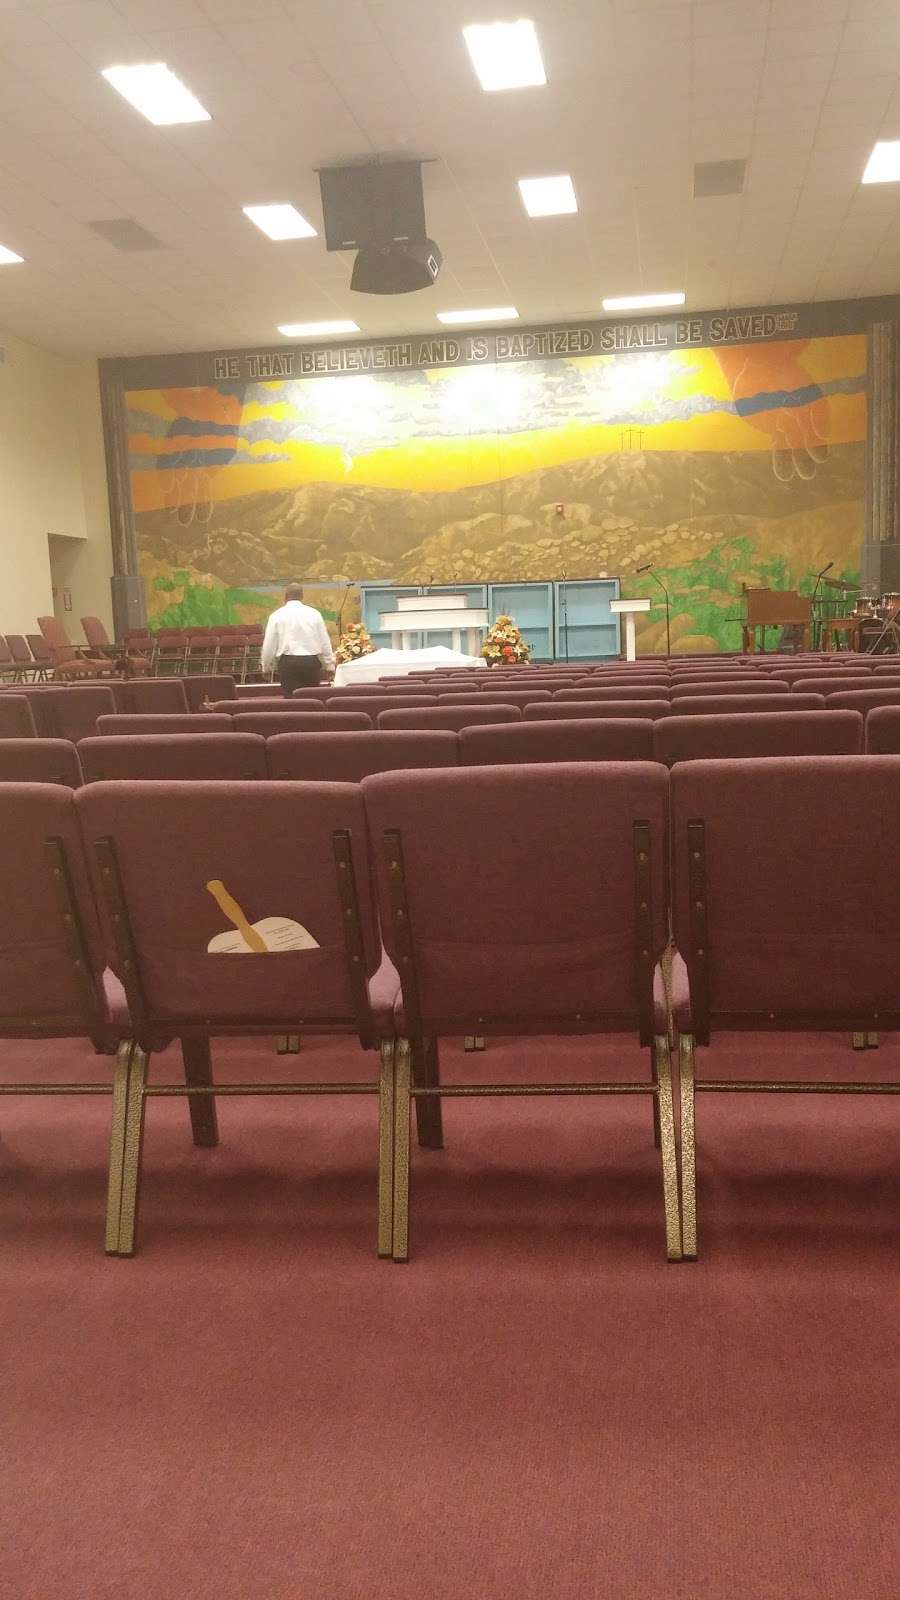 Calvary Missionary Baptist Church - church  | Photo 3 of 7 | Address: 9013 McGallion Rd, Houston, TX 77022, USA | Phone: (713) 694-2262